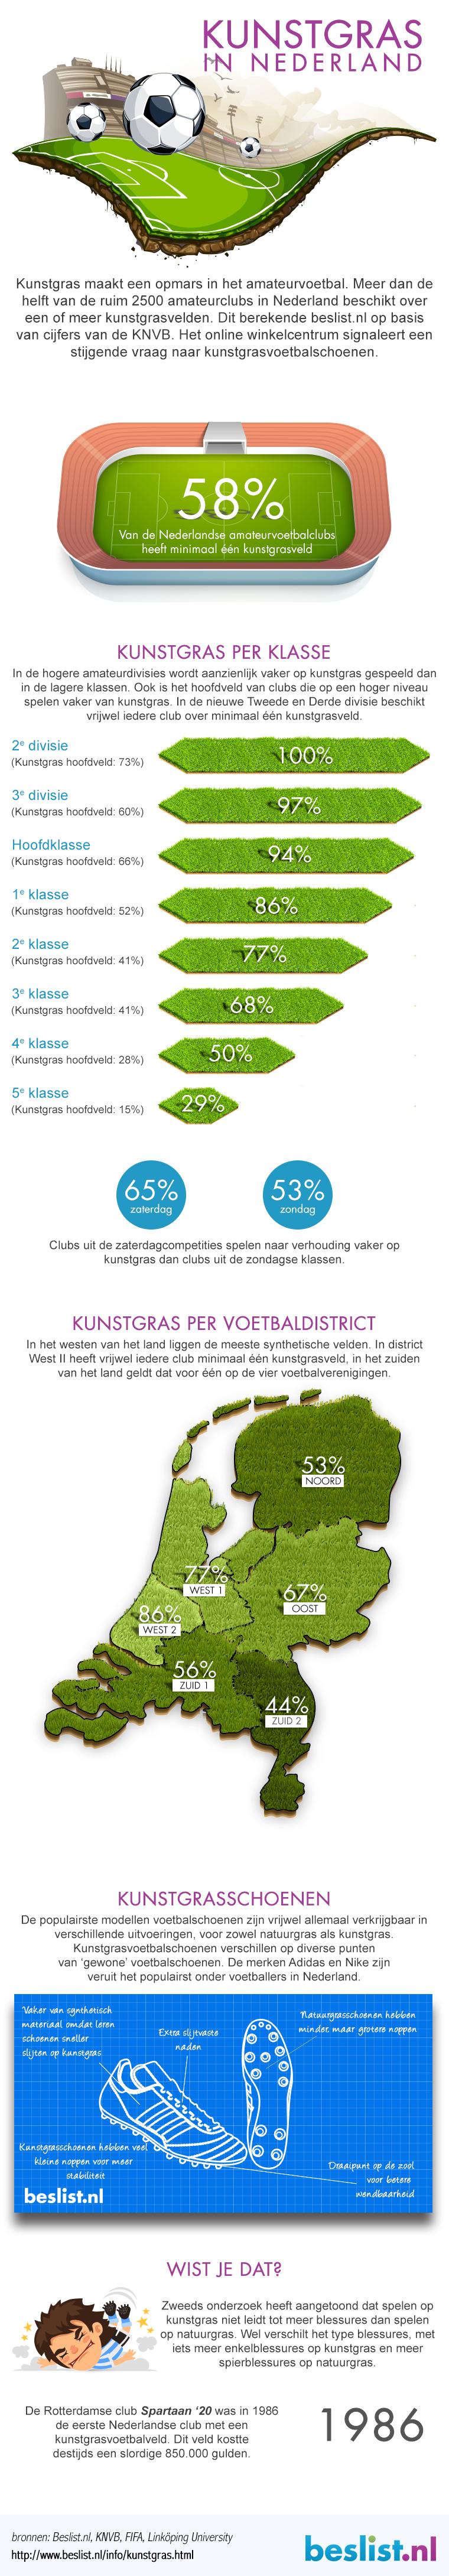 Infographic Kunstgras Nederland